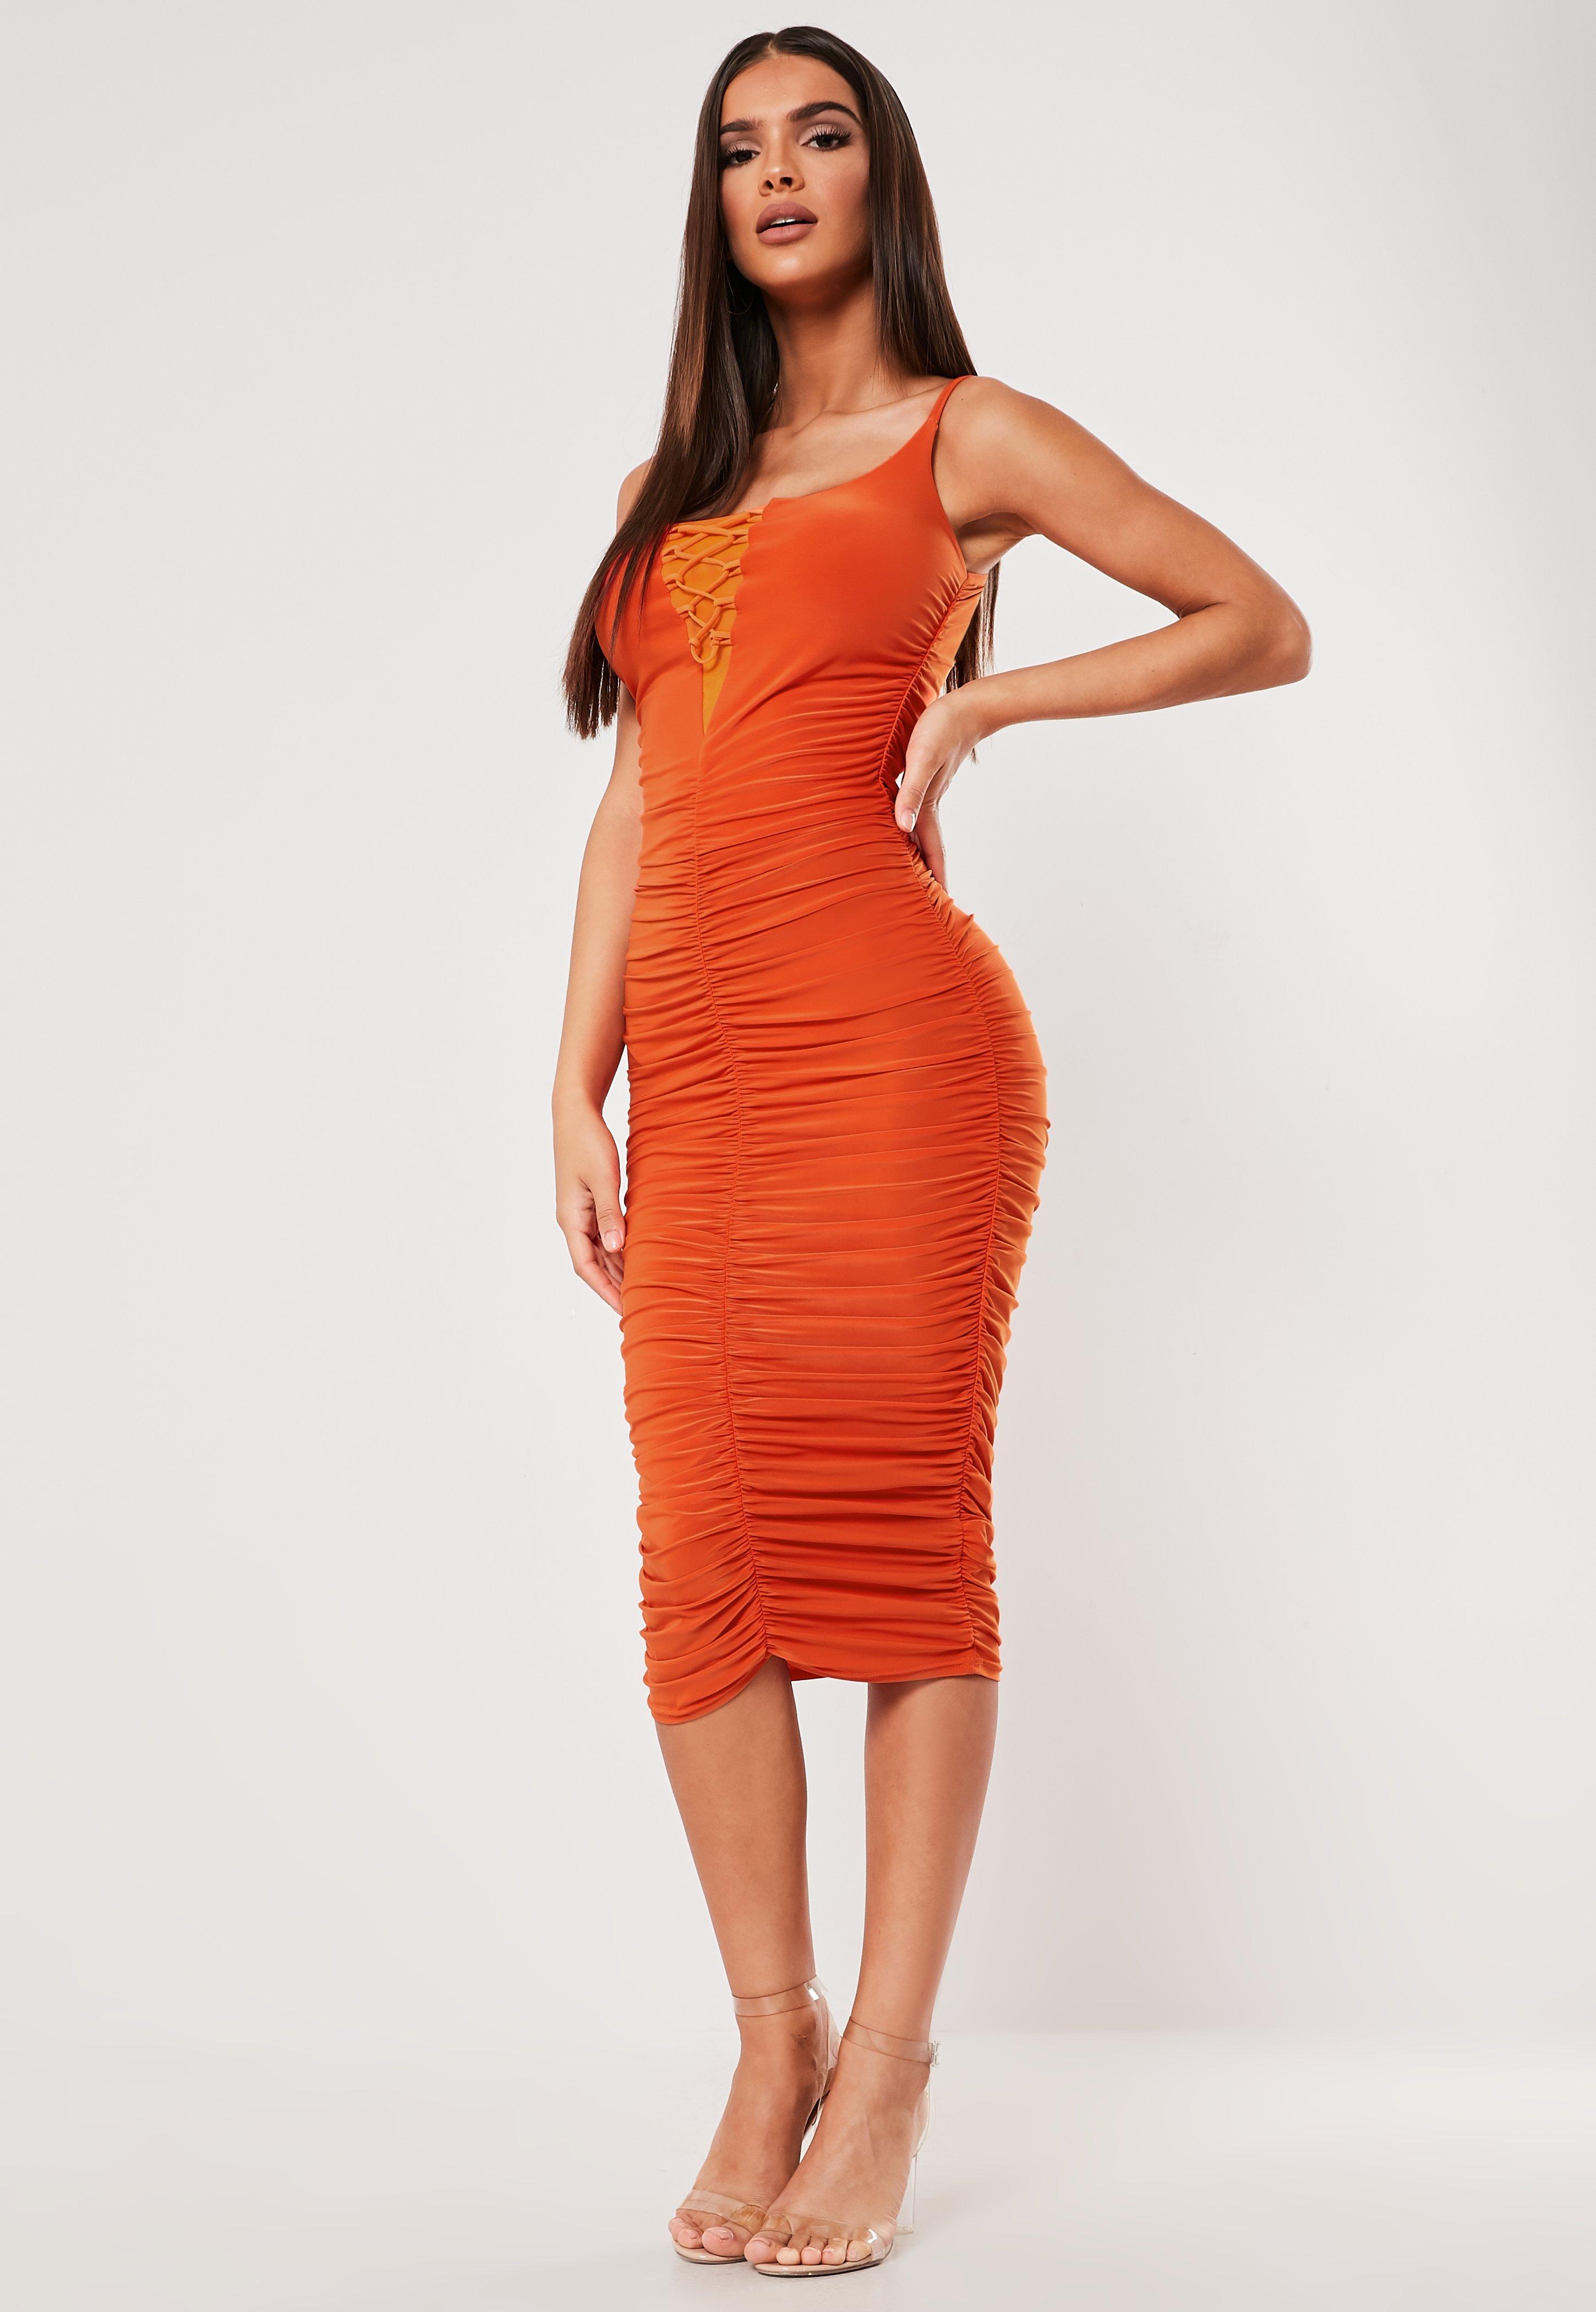 599e4402f052dc Midi Dresses   Knee Length Dresses - Missguided